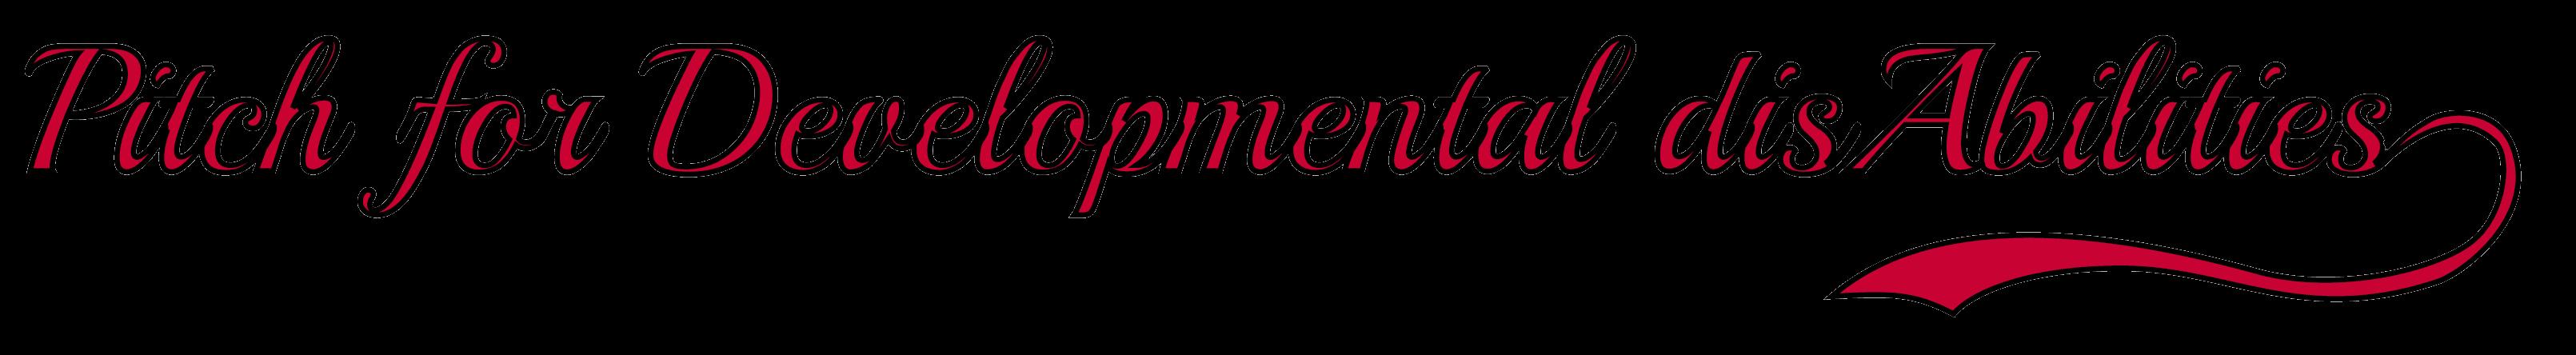 PFDD_logo